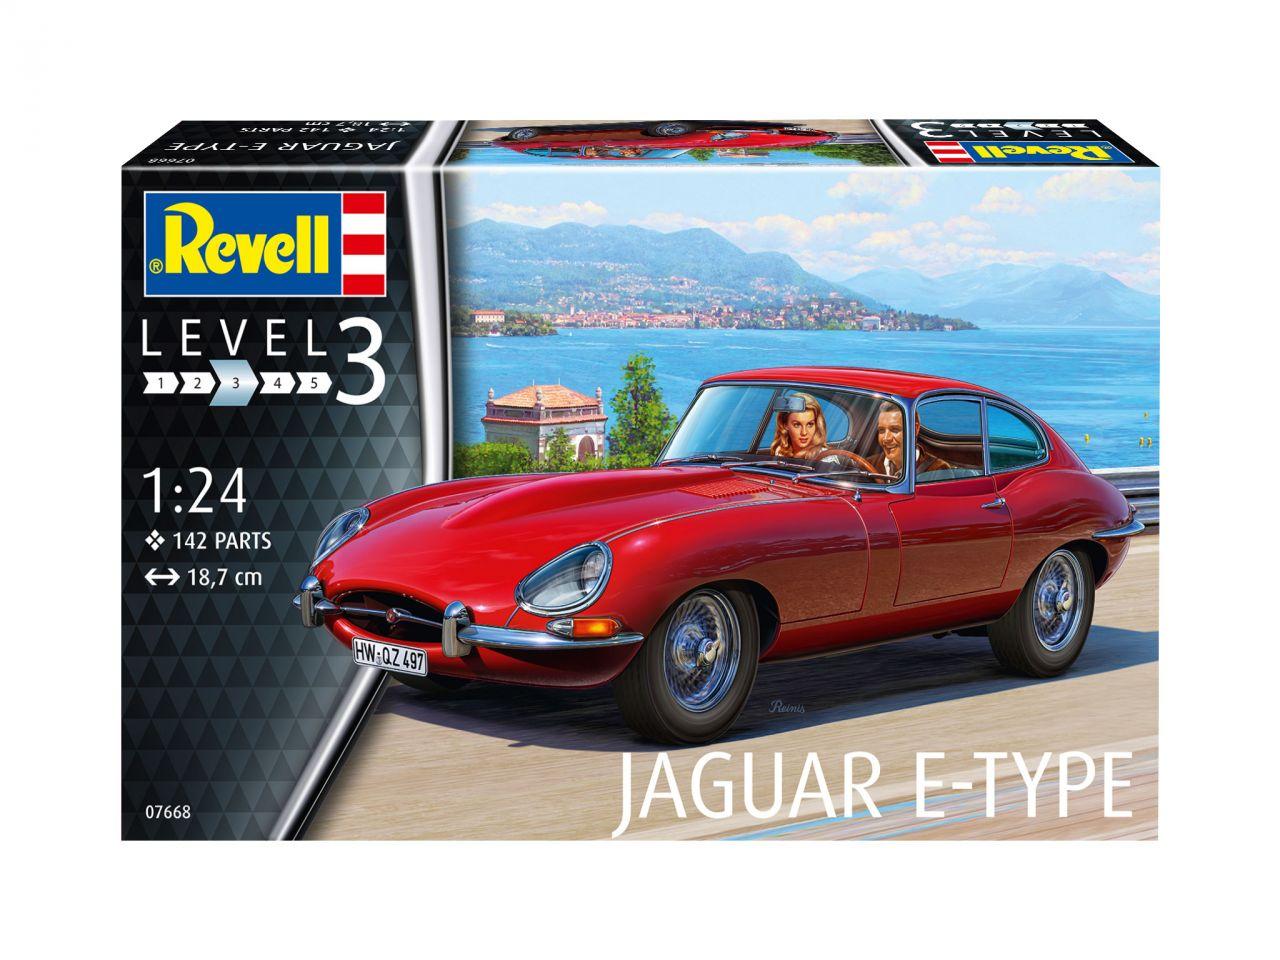 Revell 07668 Jaguar E-Type